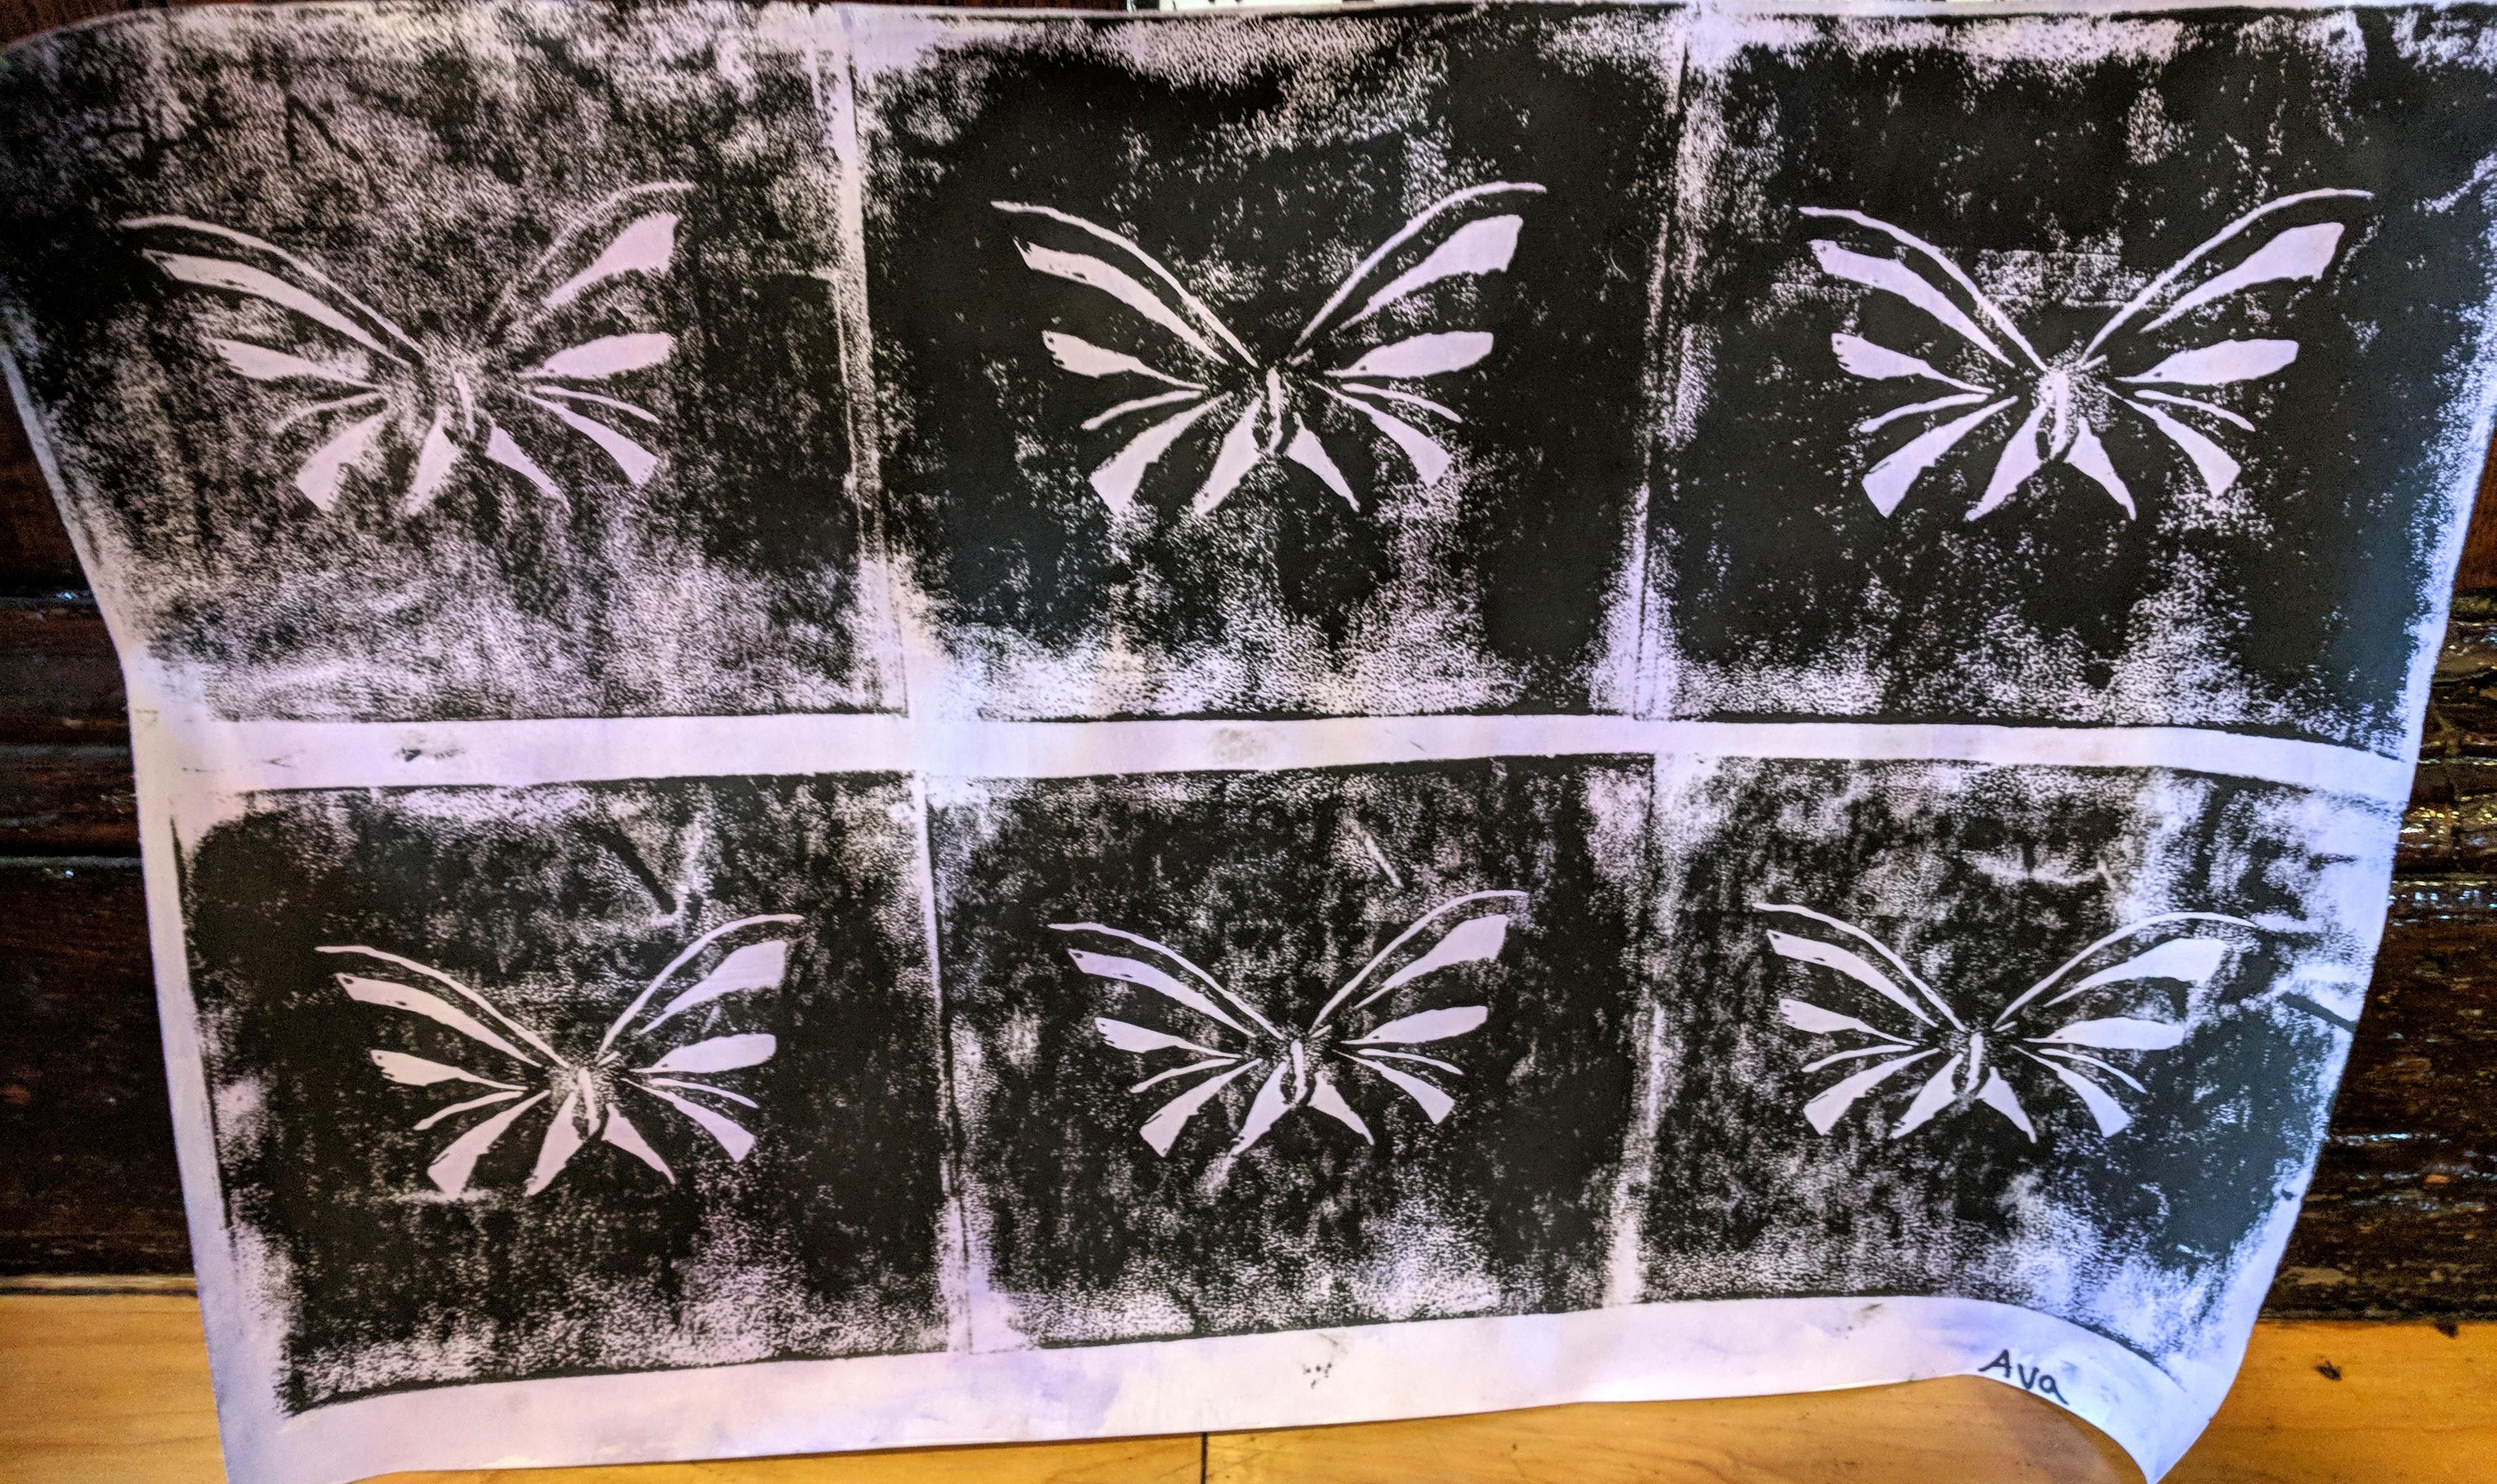 AVA - inaugural linocuts on historic Folly Cove press-teachers Brett Dunton Mary Rhinelander -GPS arts festival - City Hall Gloucester Ma - O'Maley school student art_May 12 2018 ©c ry